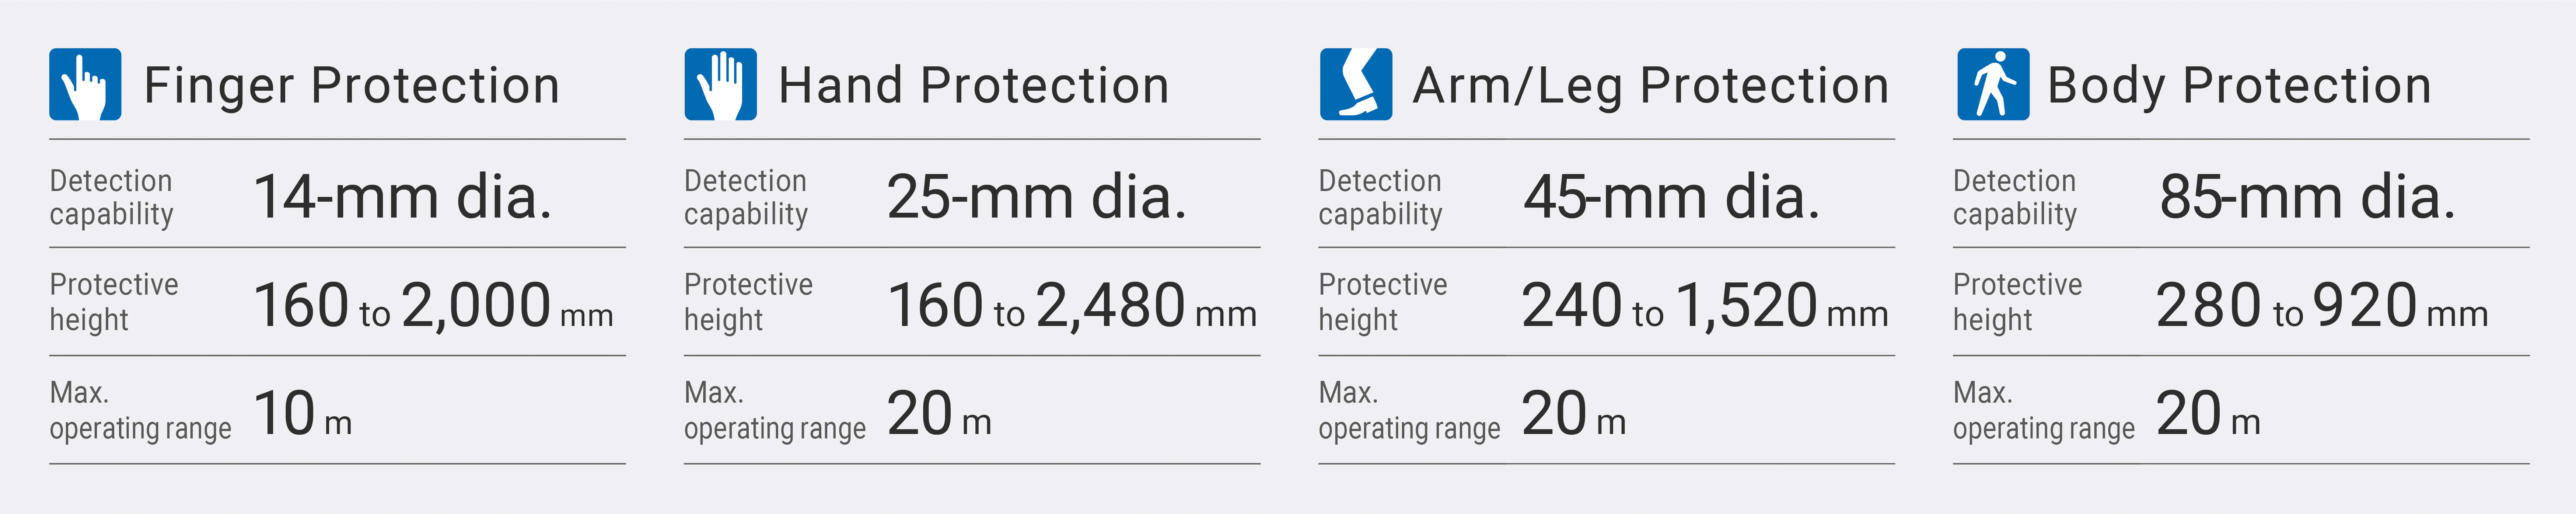 f3sg-sr_protection